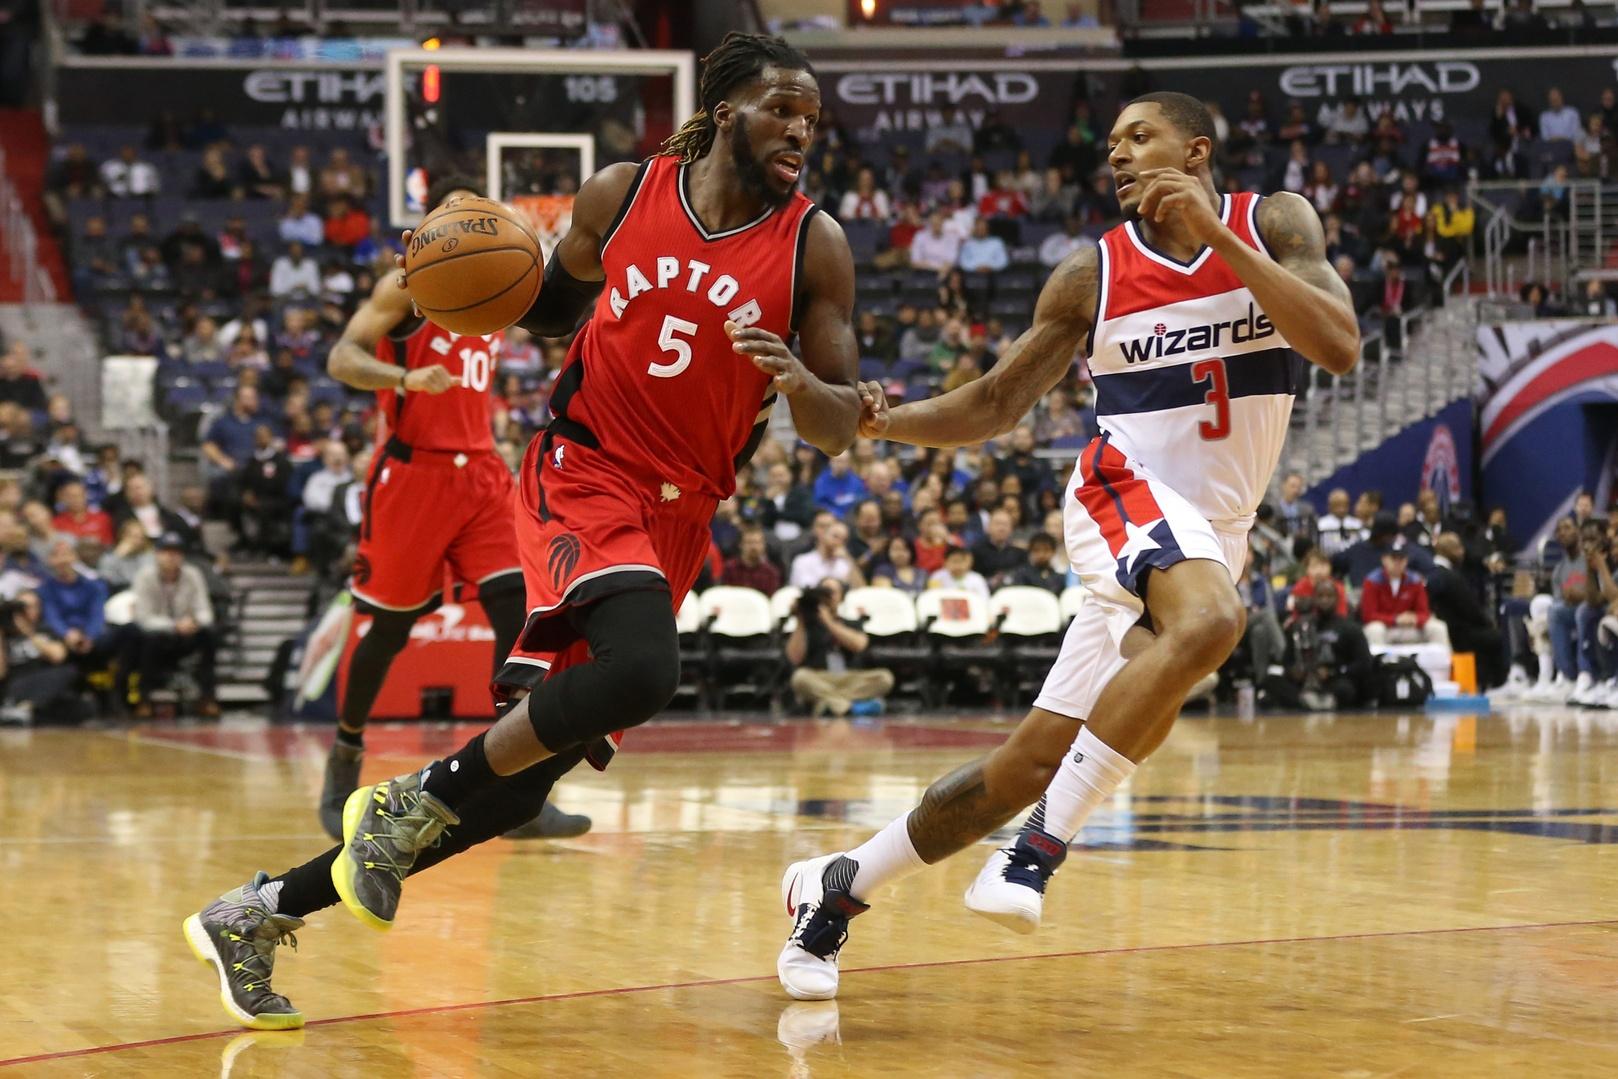 The Brooklyn Nets legit stole from the Toronto Raptors in the DeMarre Carroll trade.